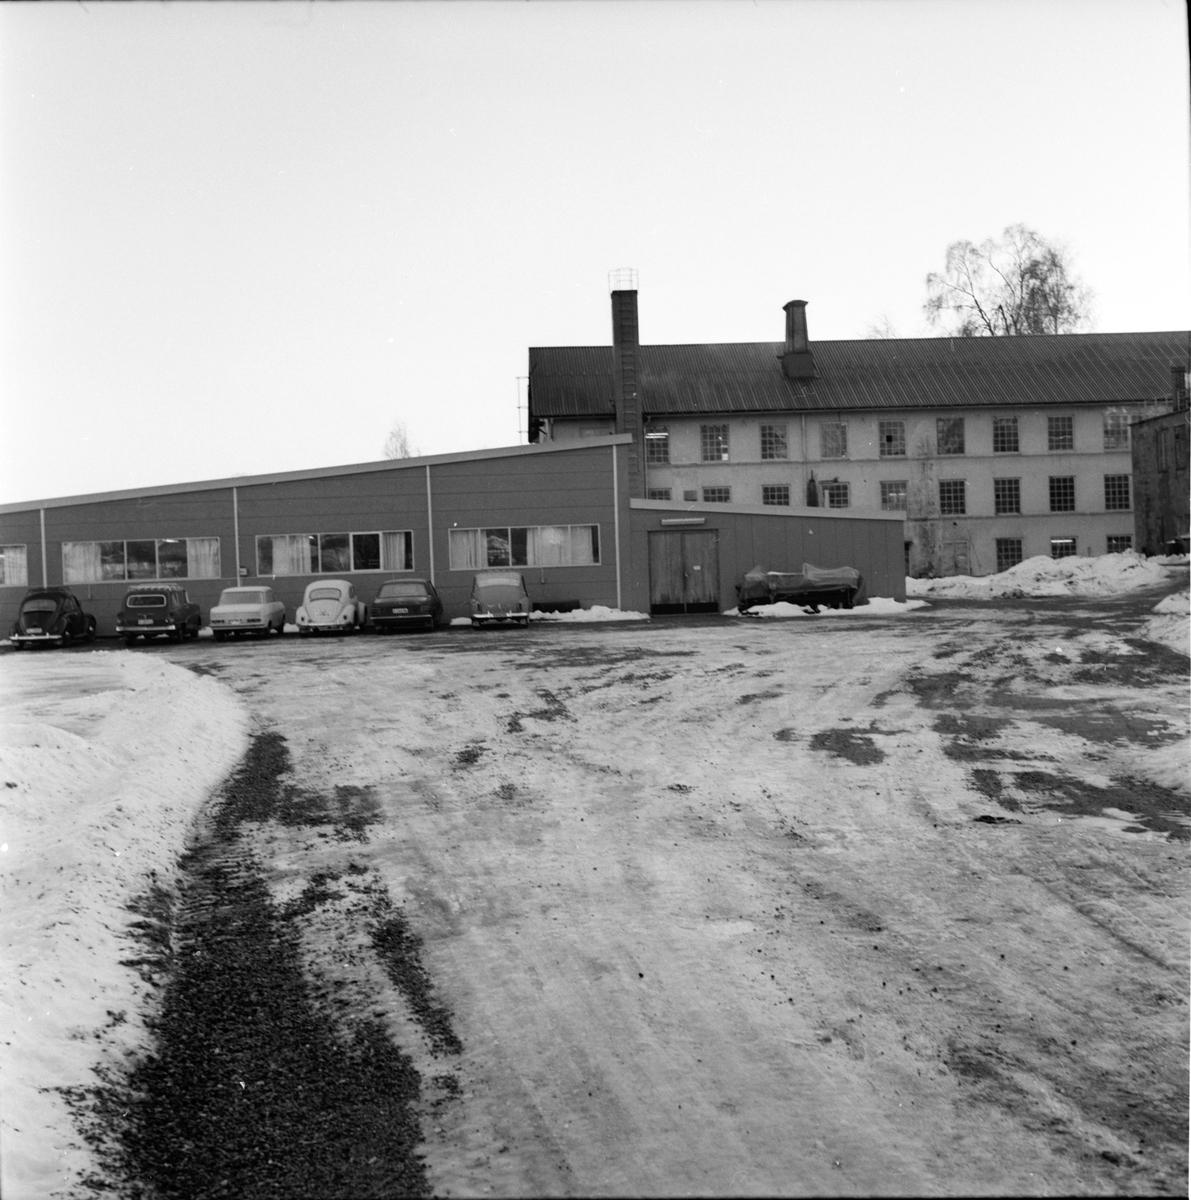 Arbrå, Forsbro ylle, Februari 1969